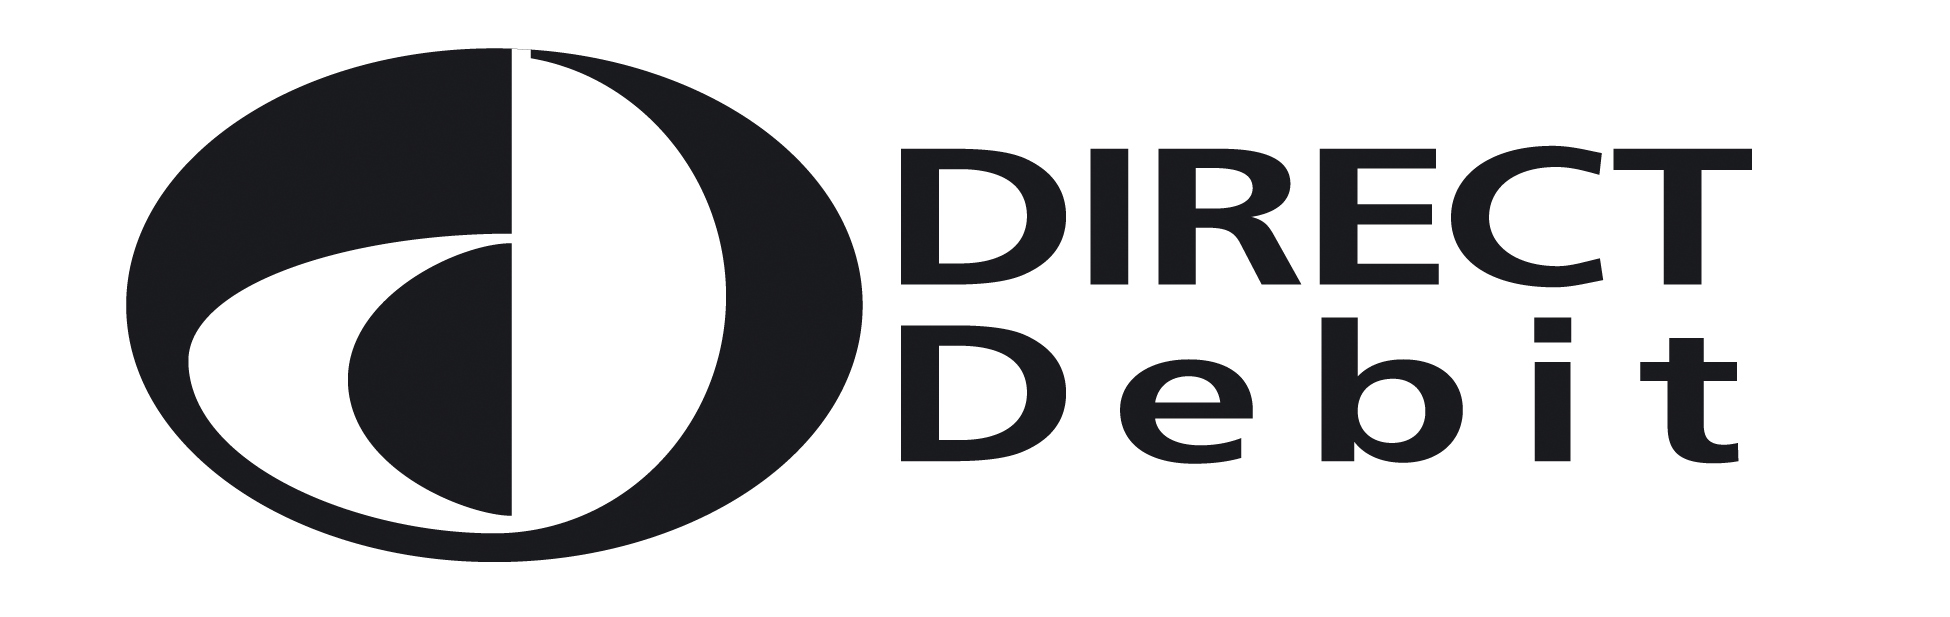 Image: Direct Debit logo